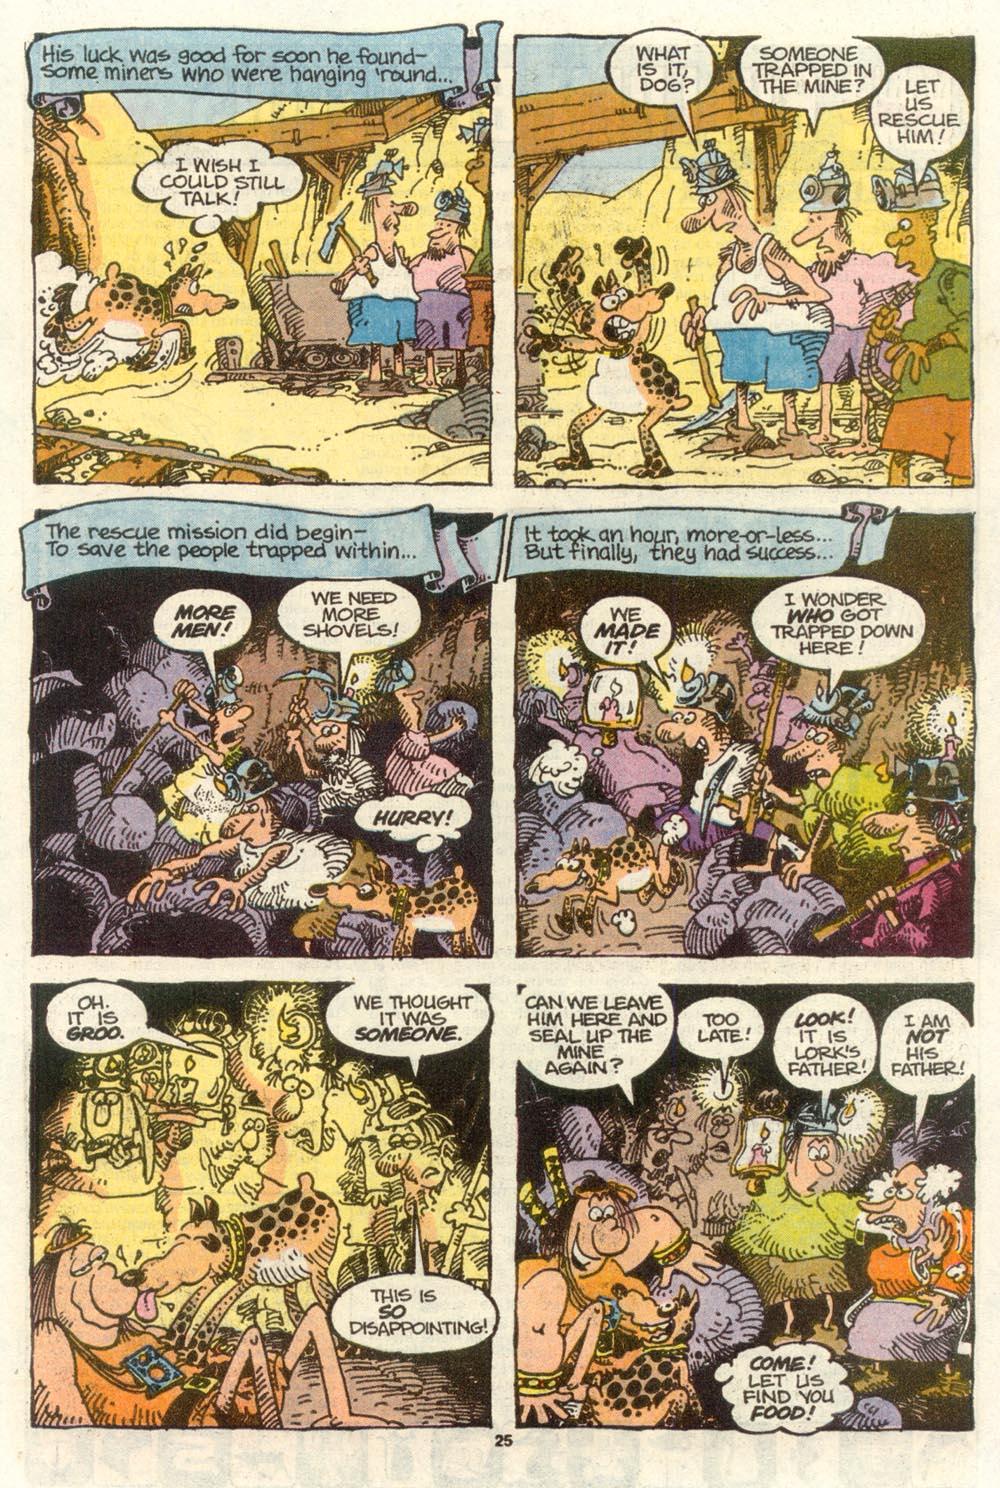 Read online Sergio Aragonés Groo the Wanderer comic -  Issue #77 - 19